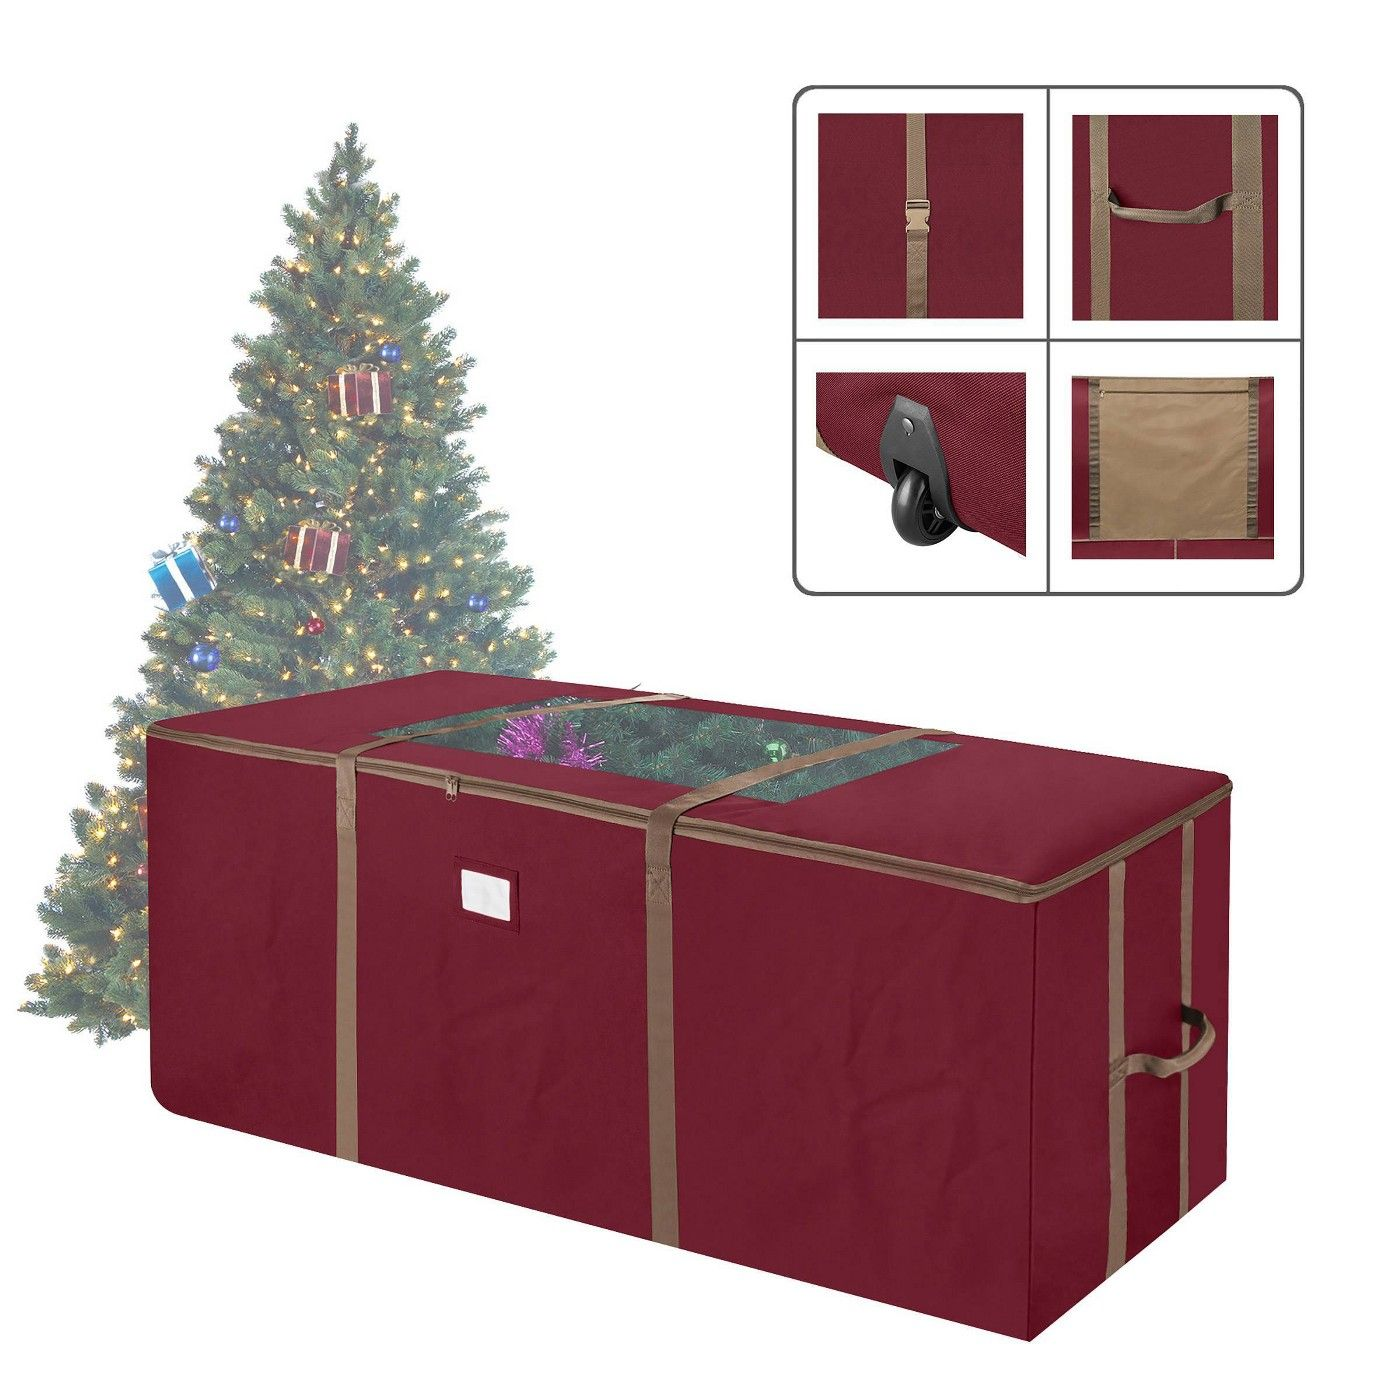 Elf Stor 9 Rolling Christmas Tree Storage Duffel Bag Red Christmas Tree Storage Bag Christmas Tree Storage Christmas Storage